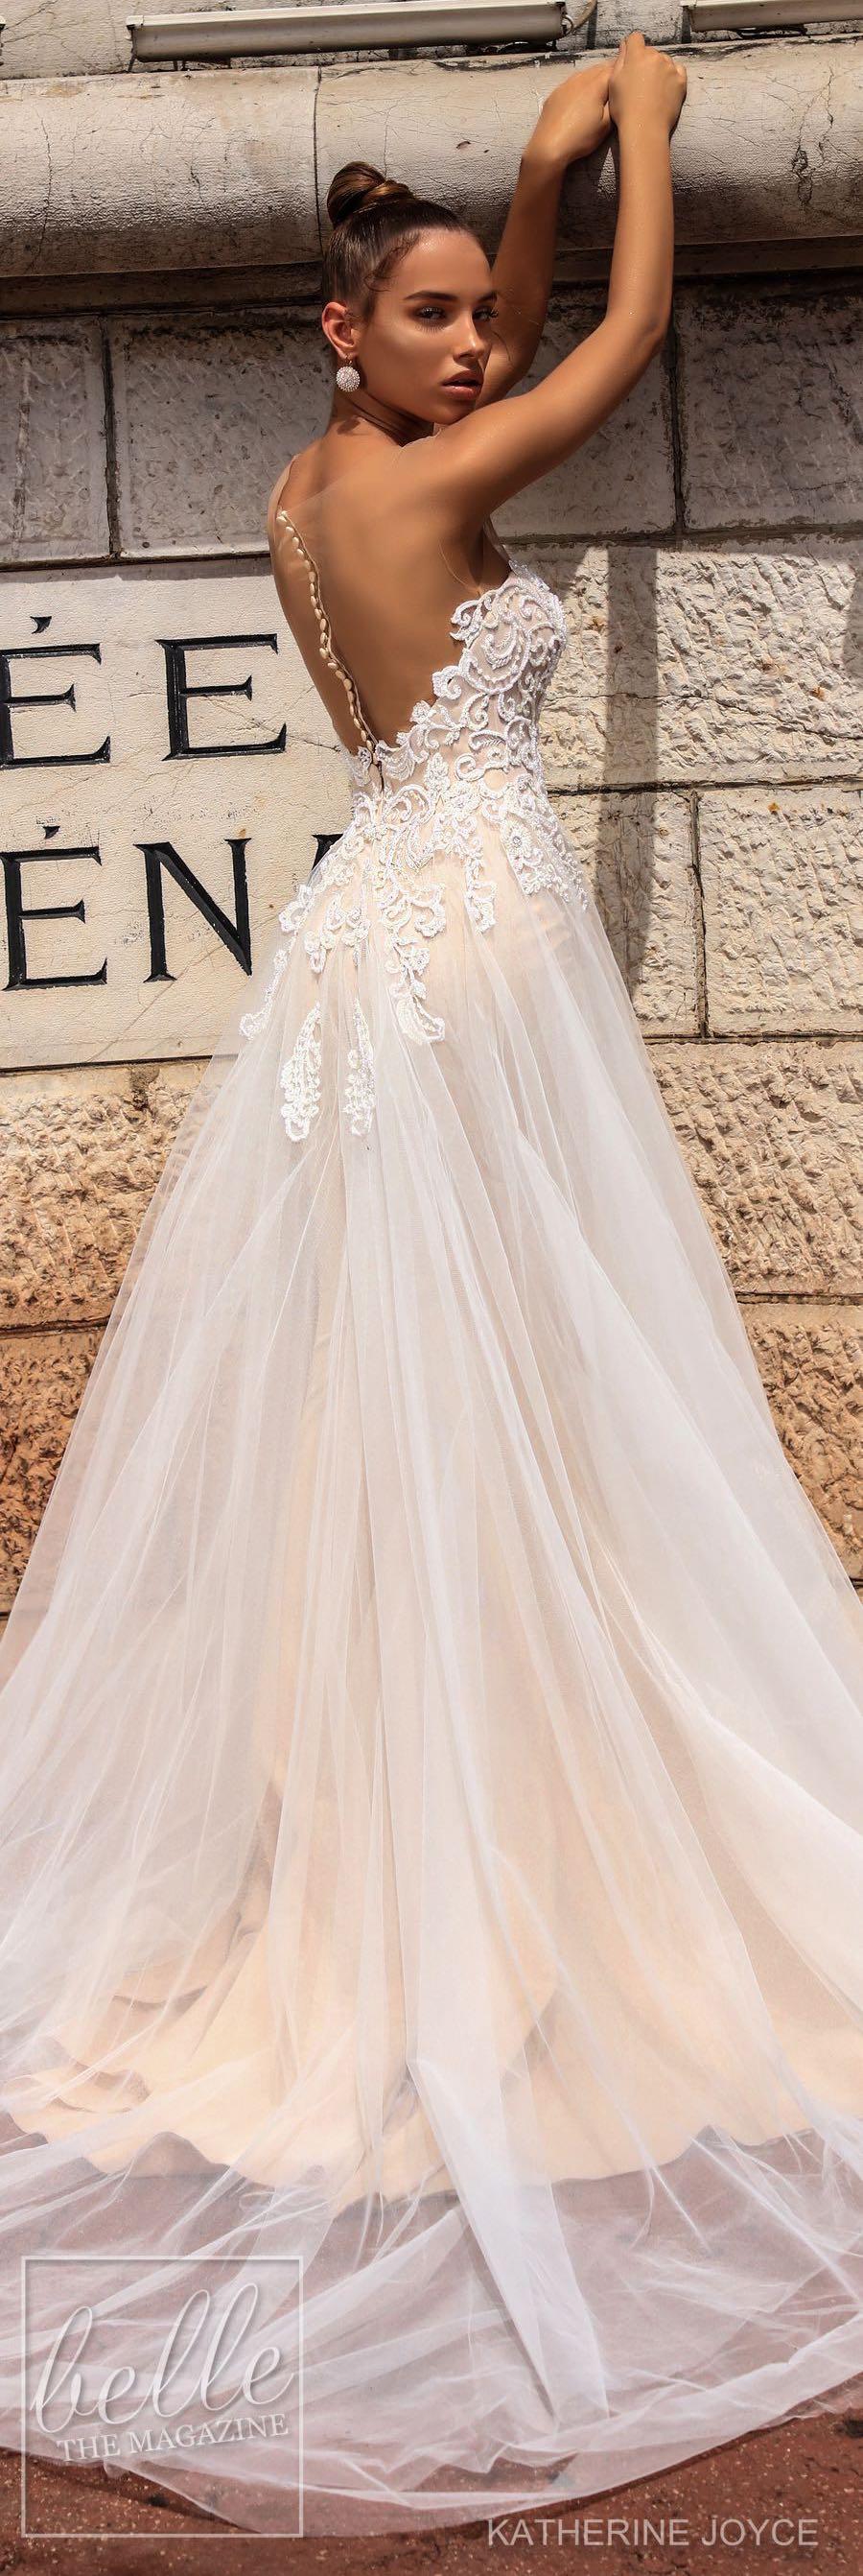 Wedding dresses by katherine joyce bridal ma cheri collection